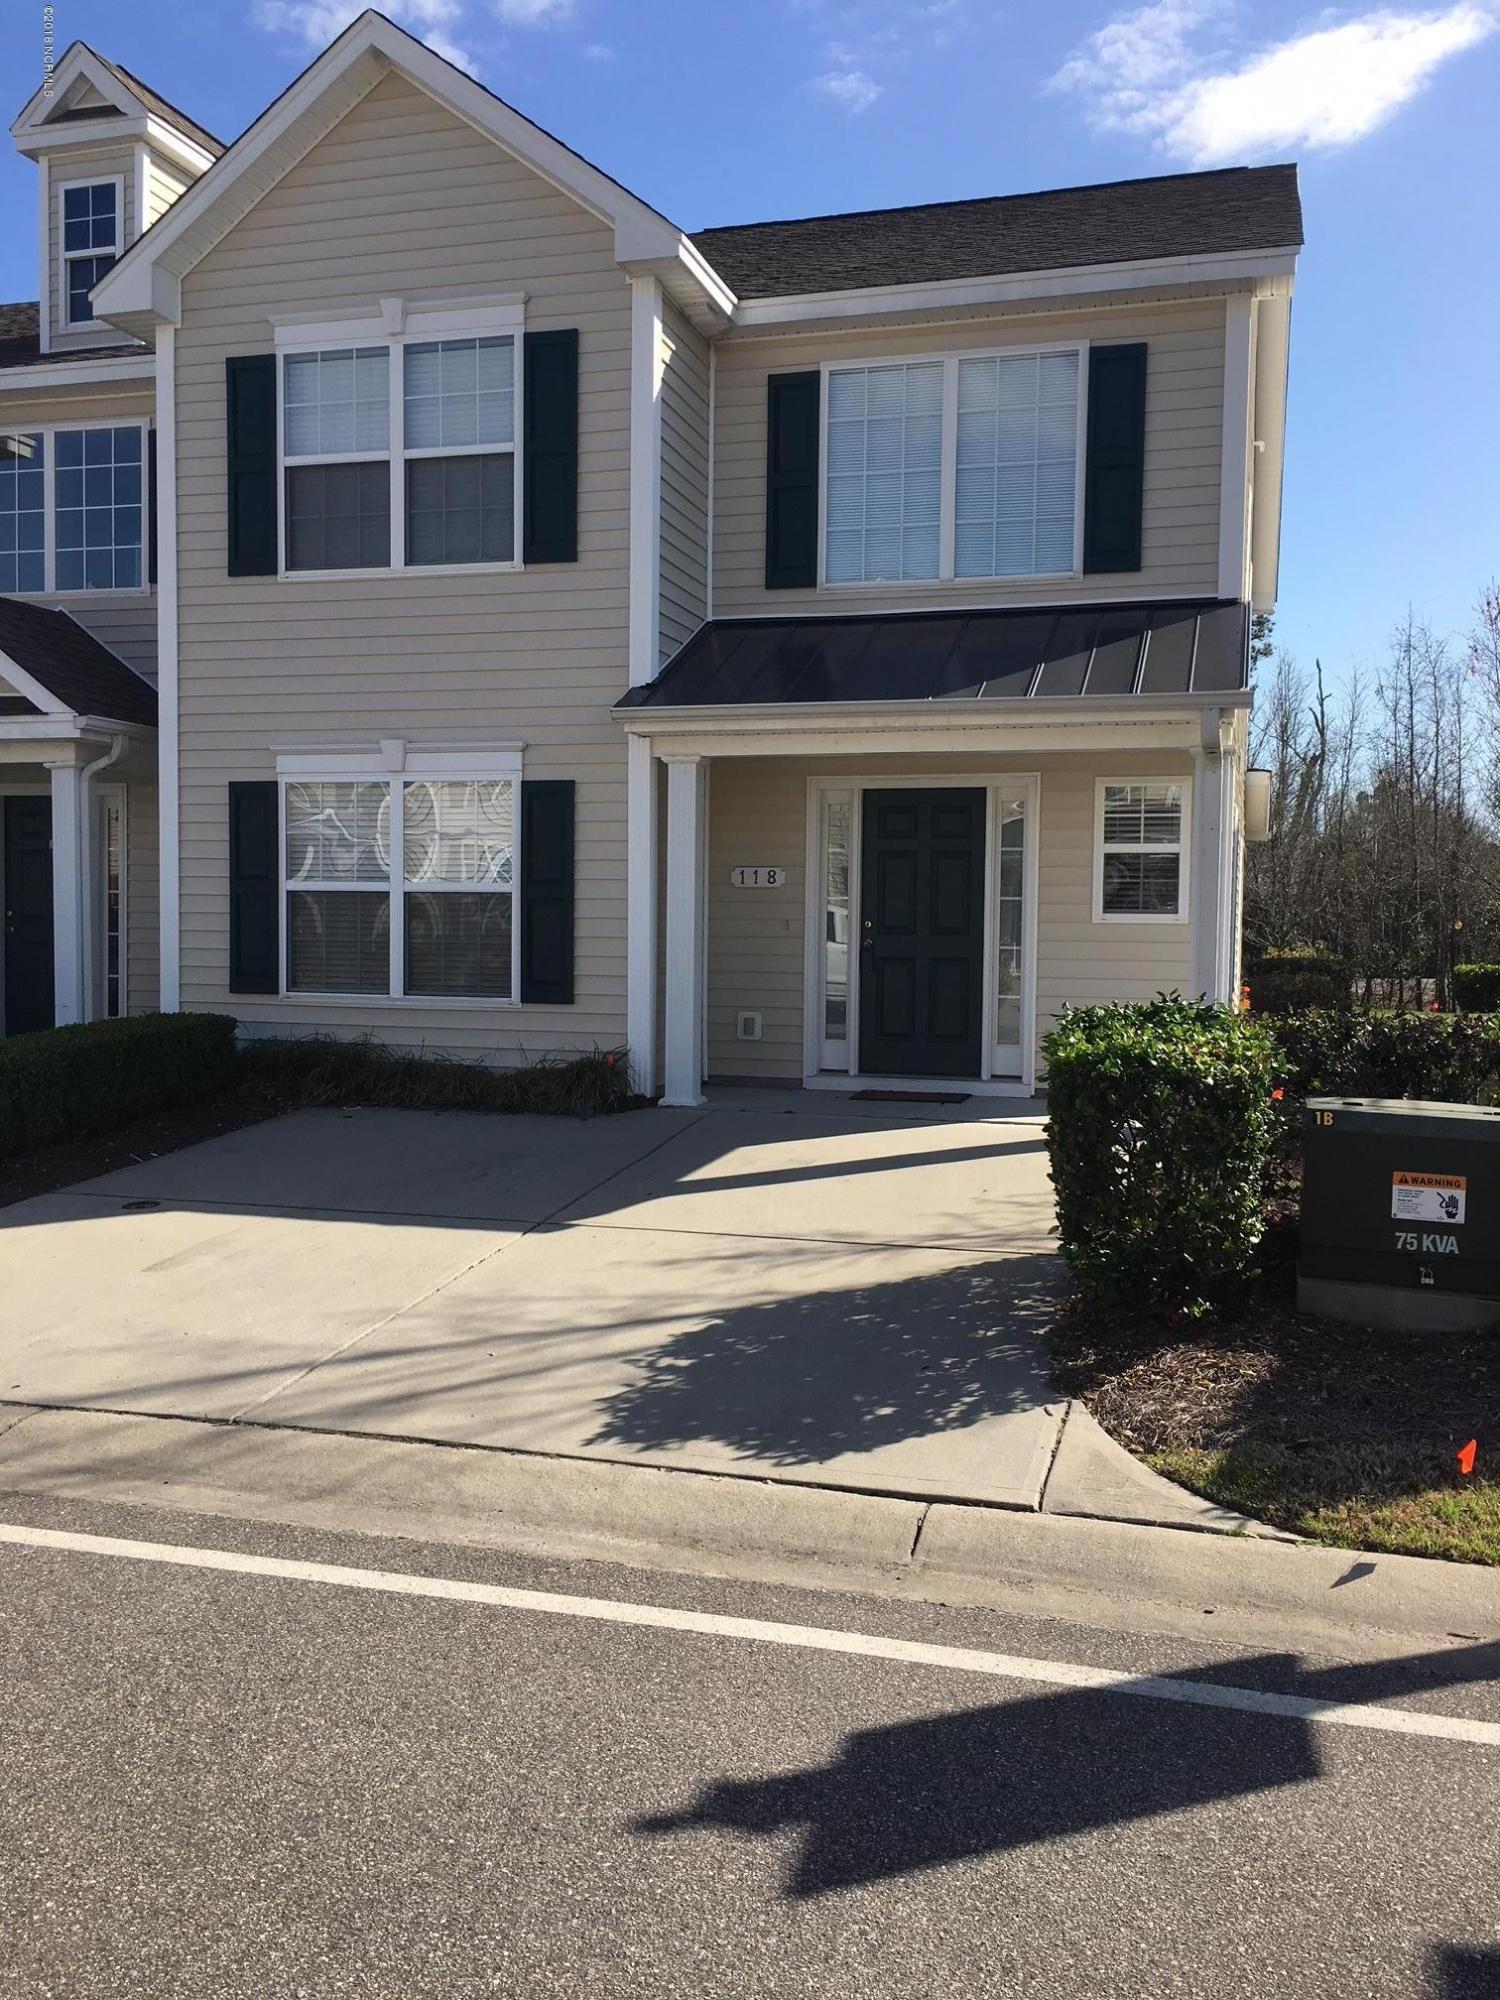 Carolina Plantations Real Estate - MLS Number: 100102800